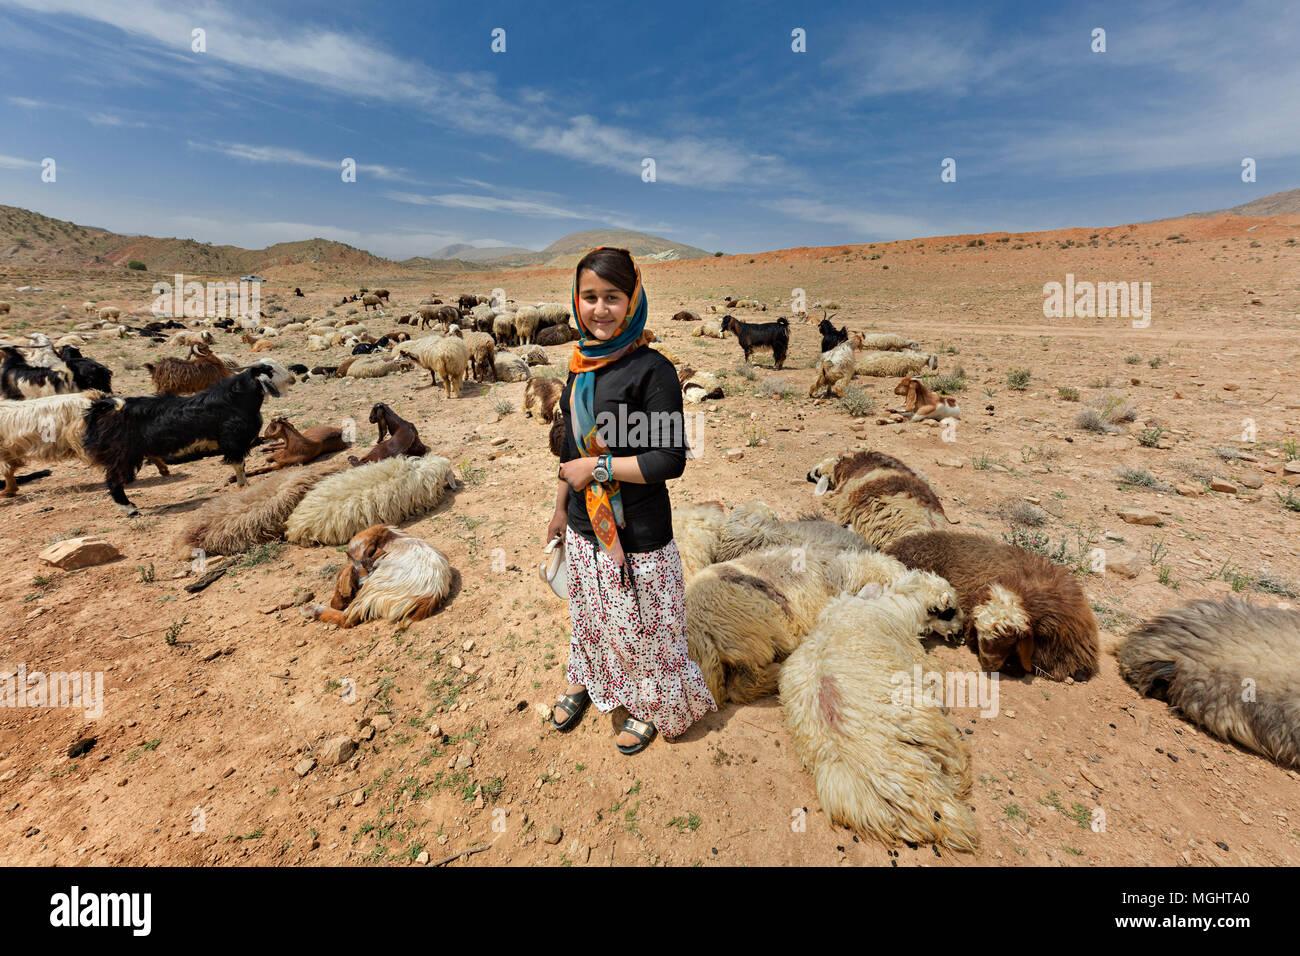 Iranian nomadic shepherdess belonging to the tribe known as Qashqai, herds goats and sheep, in Firuzabad, Iran. - Stock Image